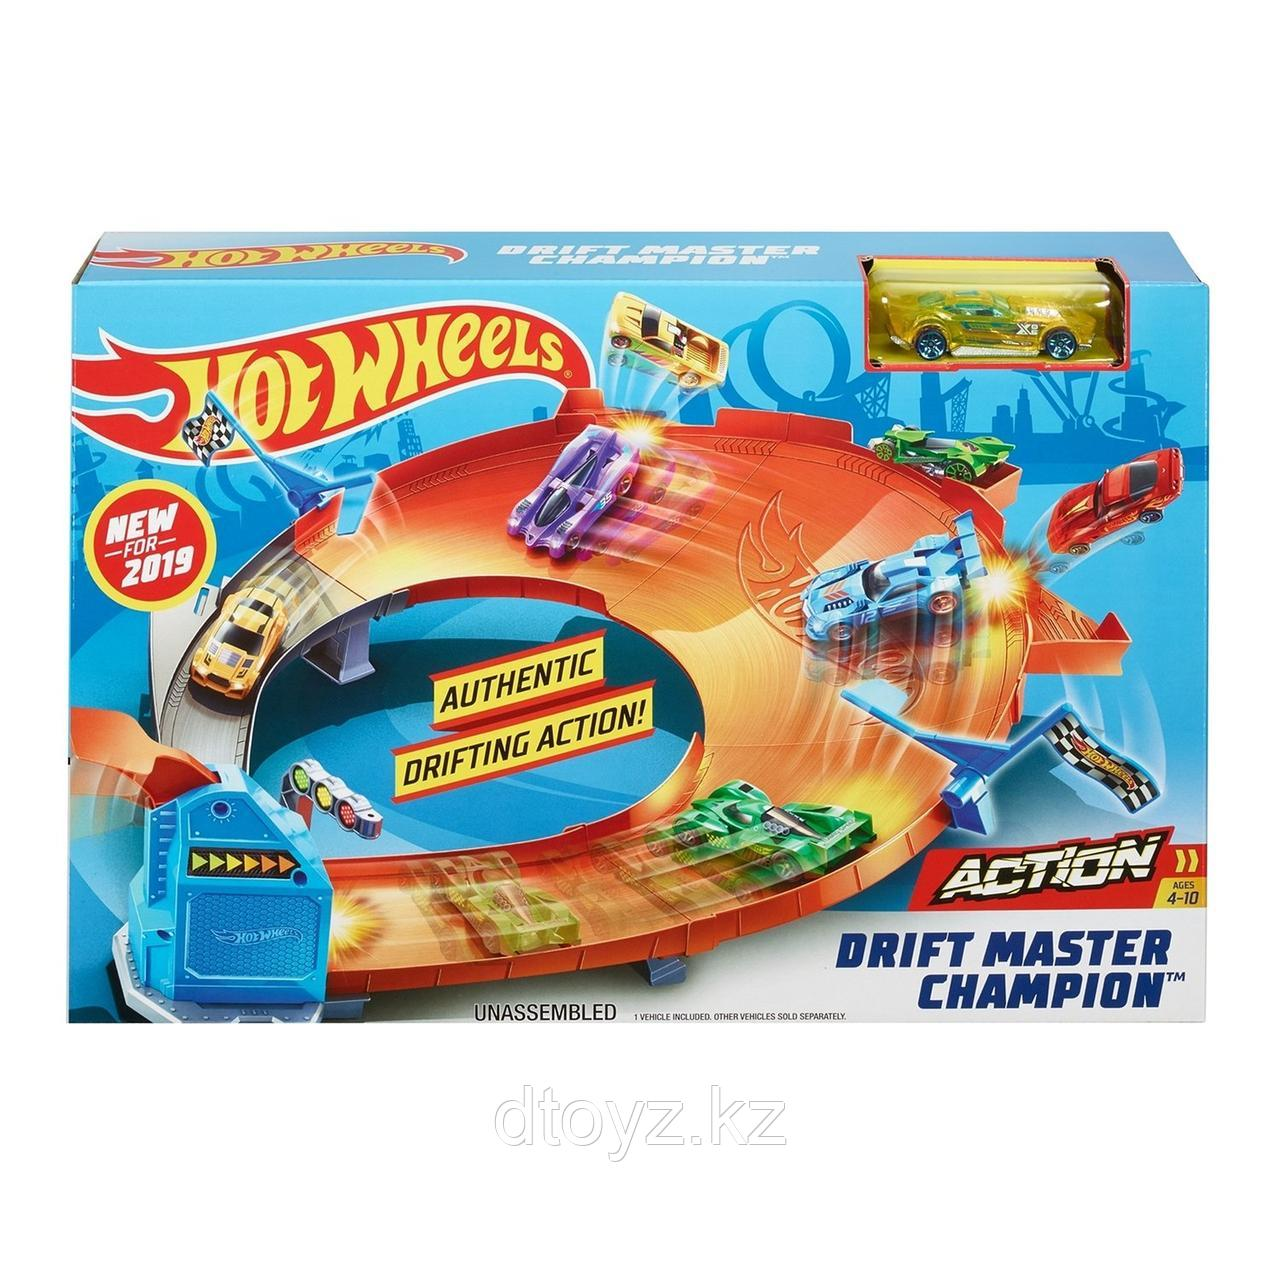 Hot Wheels Игровой набор Чемпион Мастер дрифта